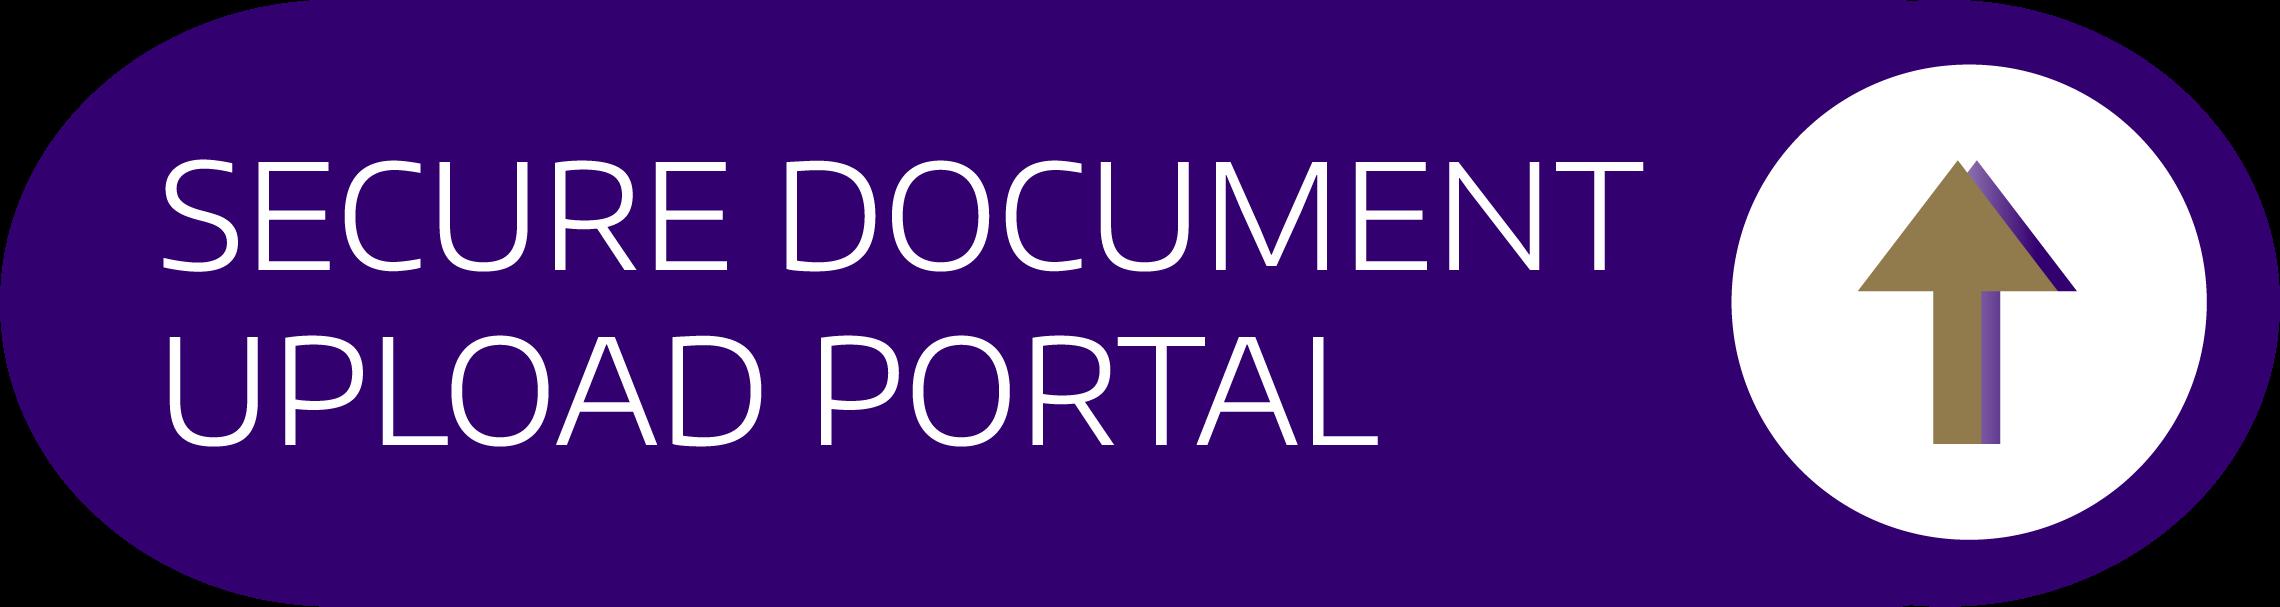 Secure Document Upload Portal